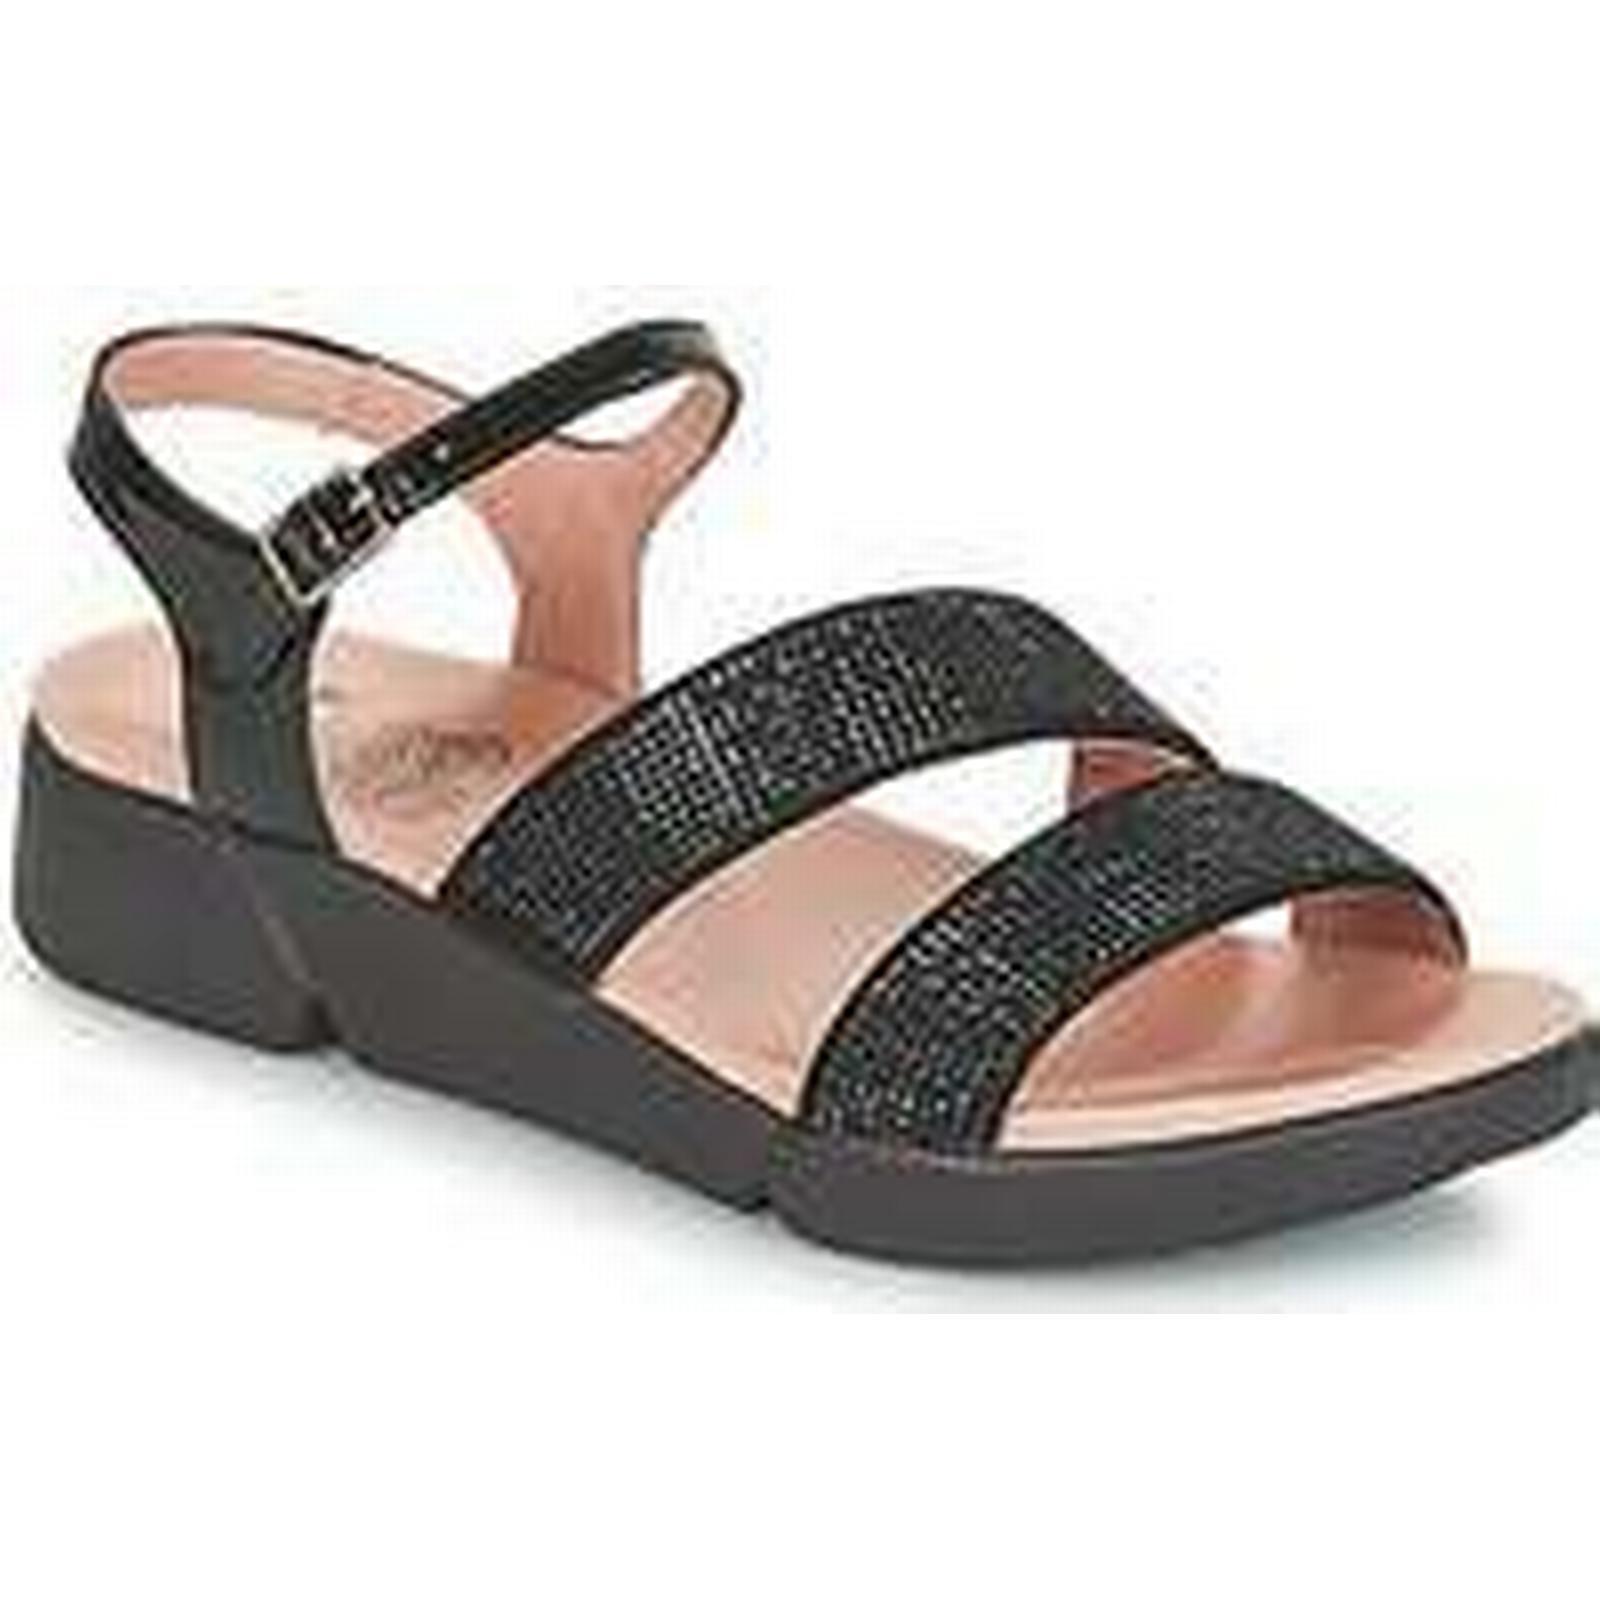 Spartoo.co.uk Wonders women's CRUSTOU women's Wonders Sandals in Black b88143